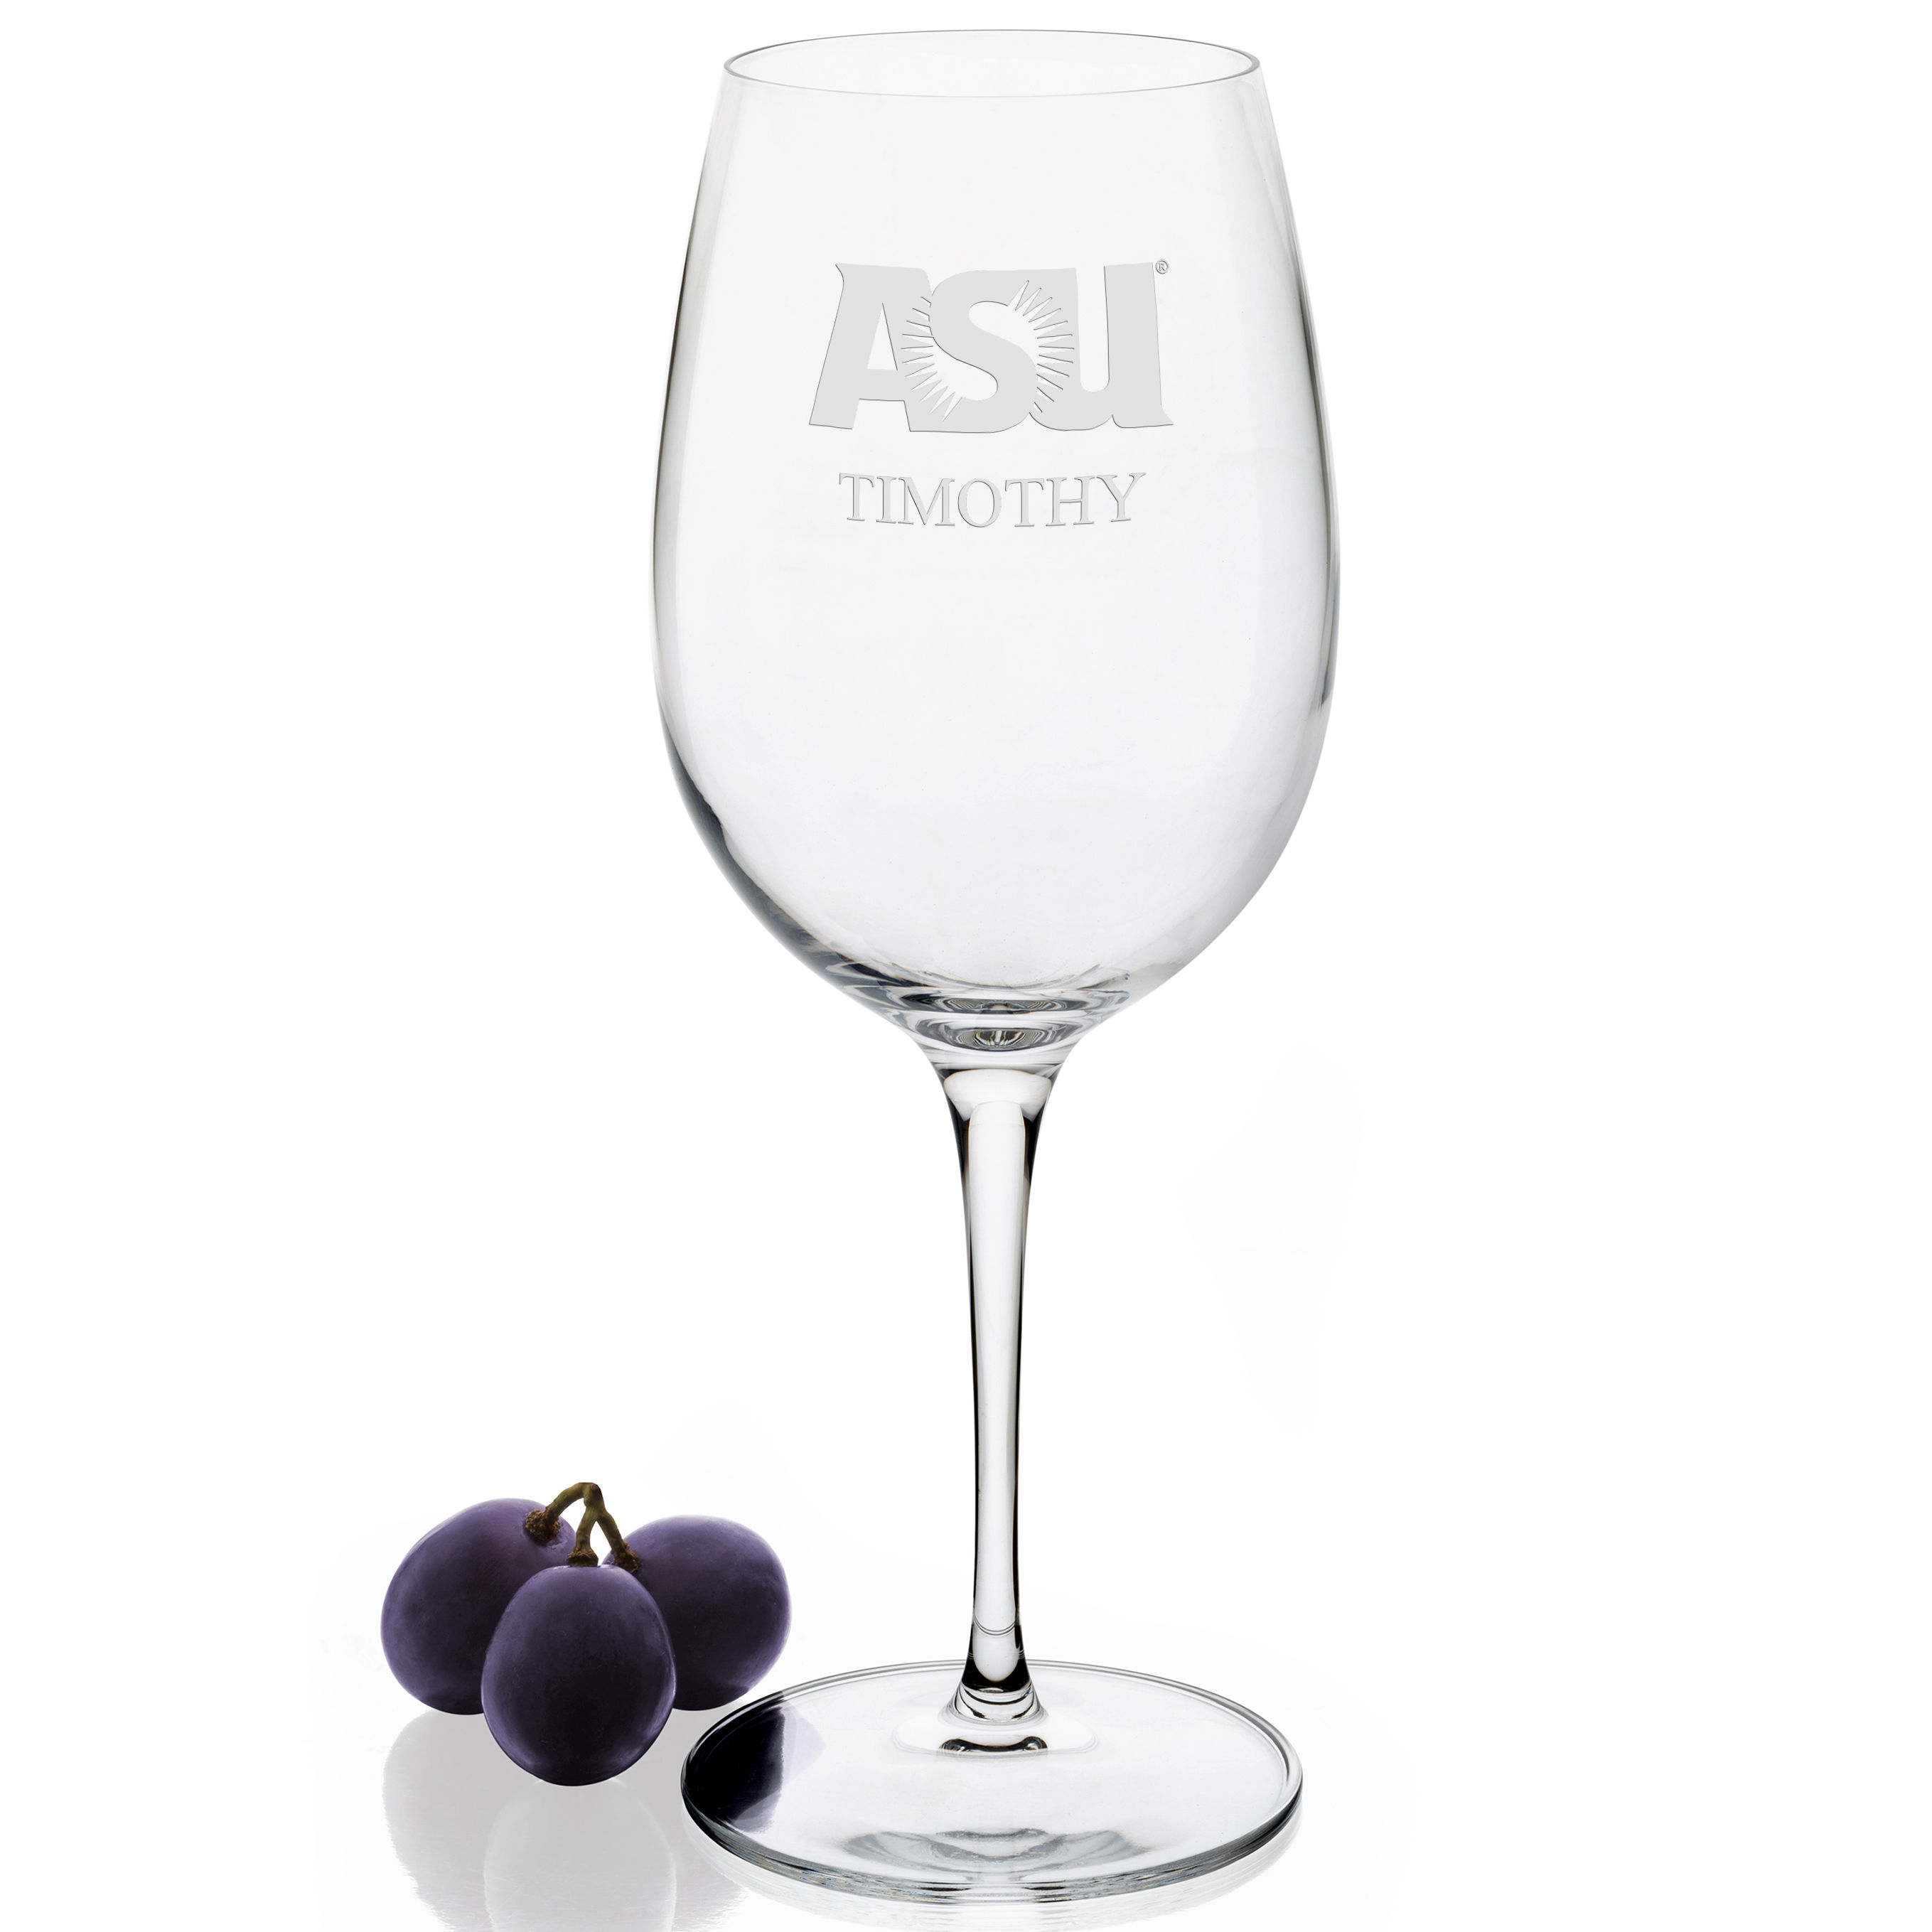 ASU Red Wine Glasses - Set of 4